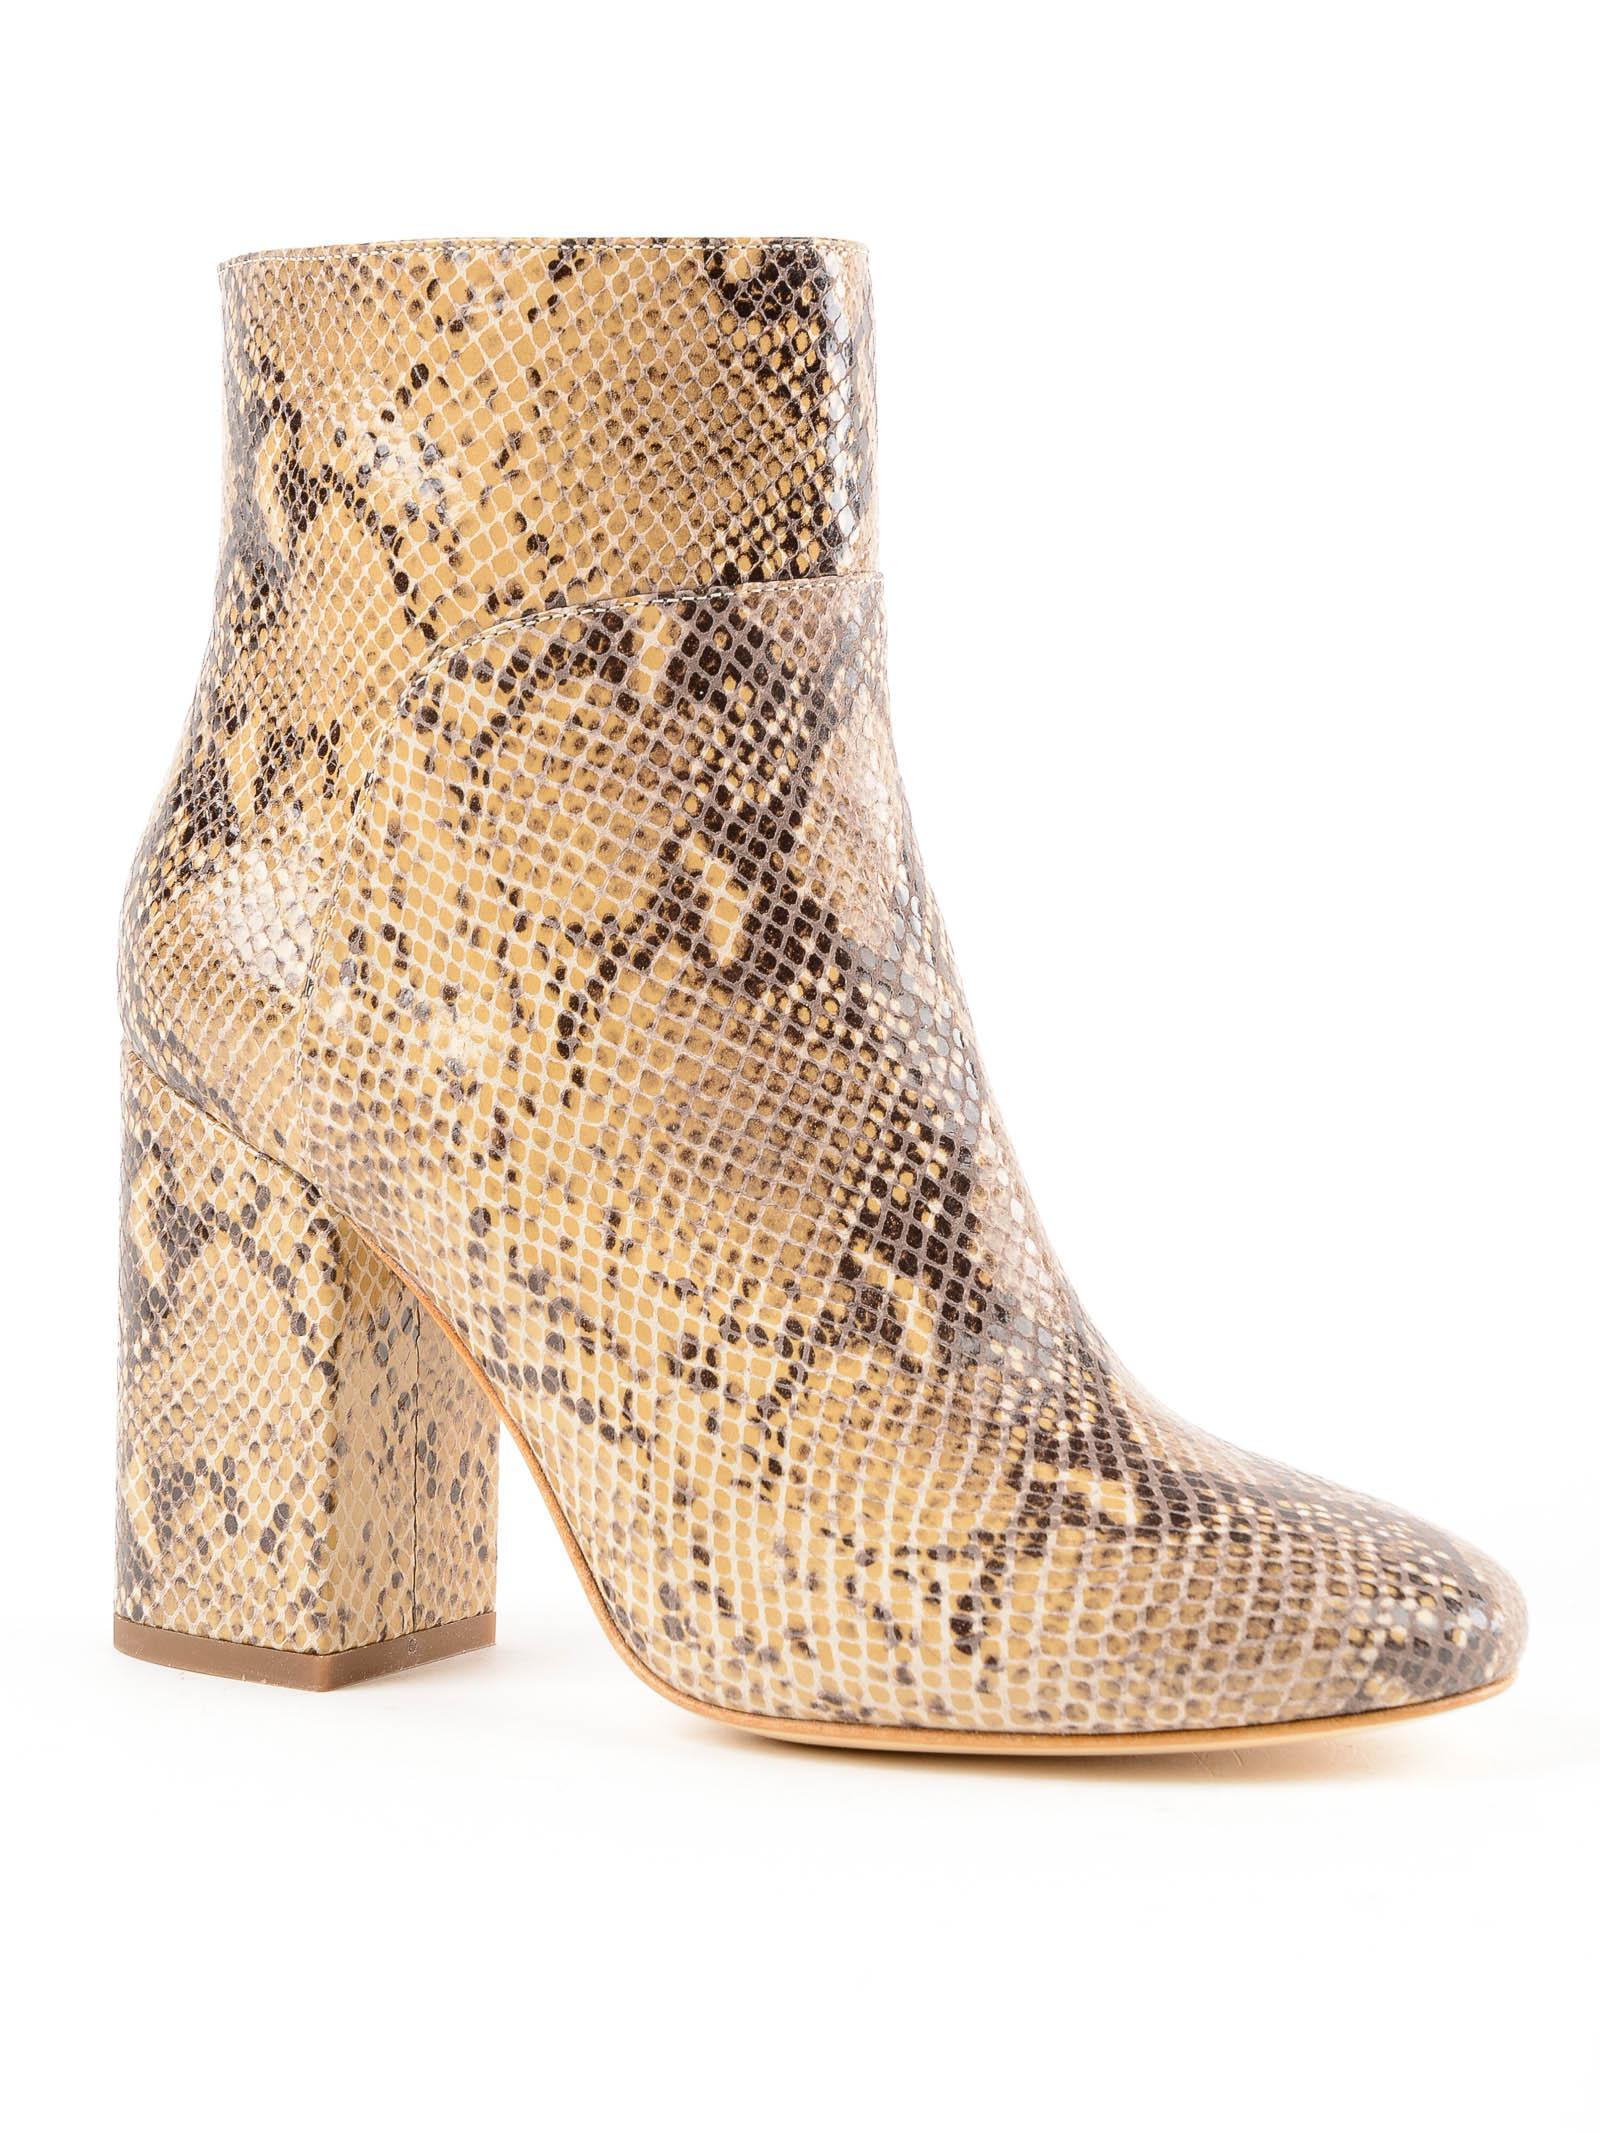 14980f1c14368a chiara ferragni and sam edelman utah suede fringe boots photograph ...